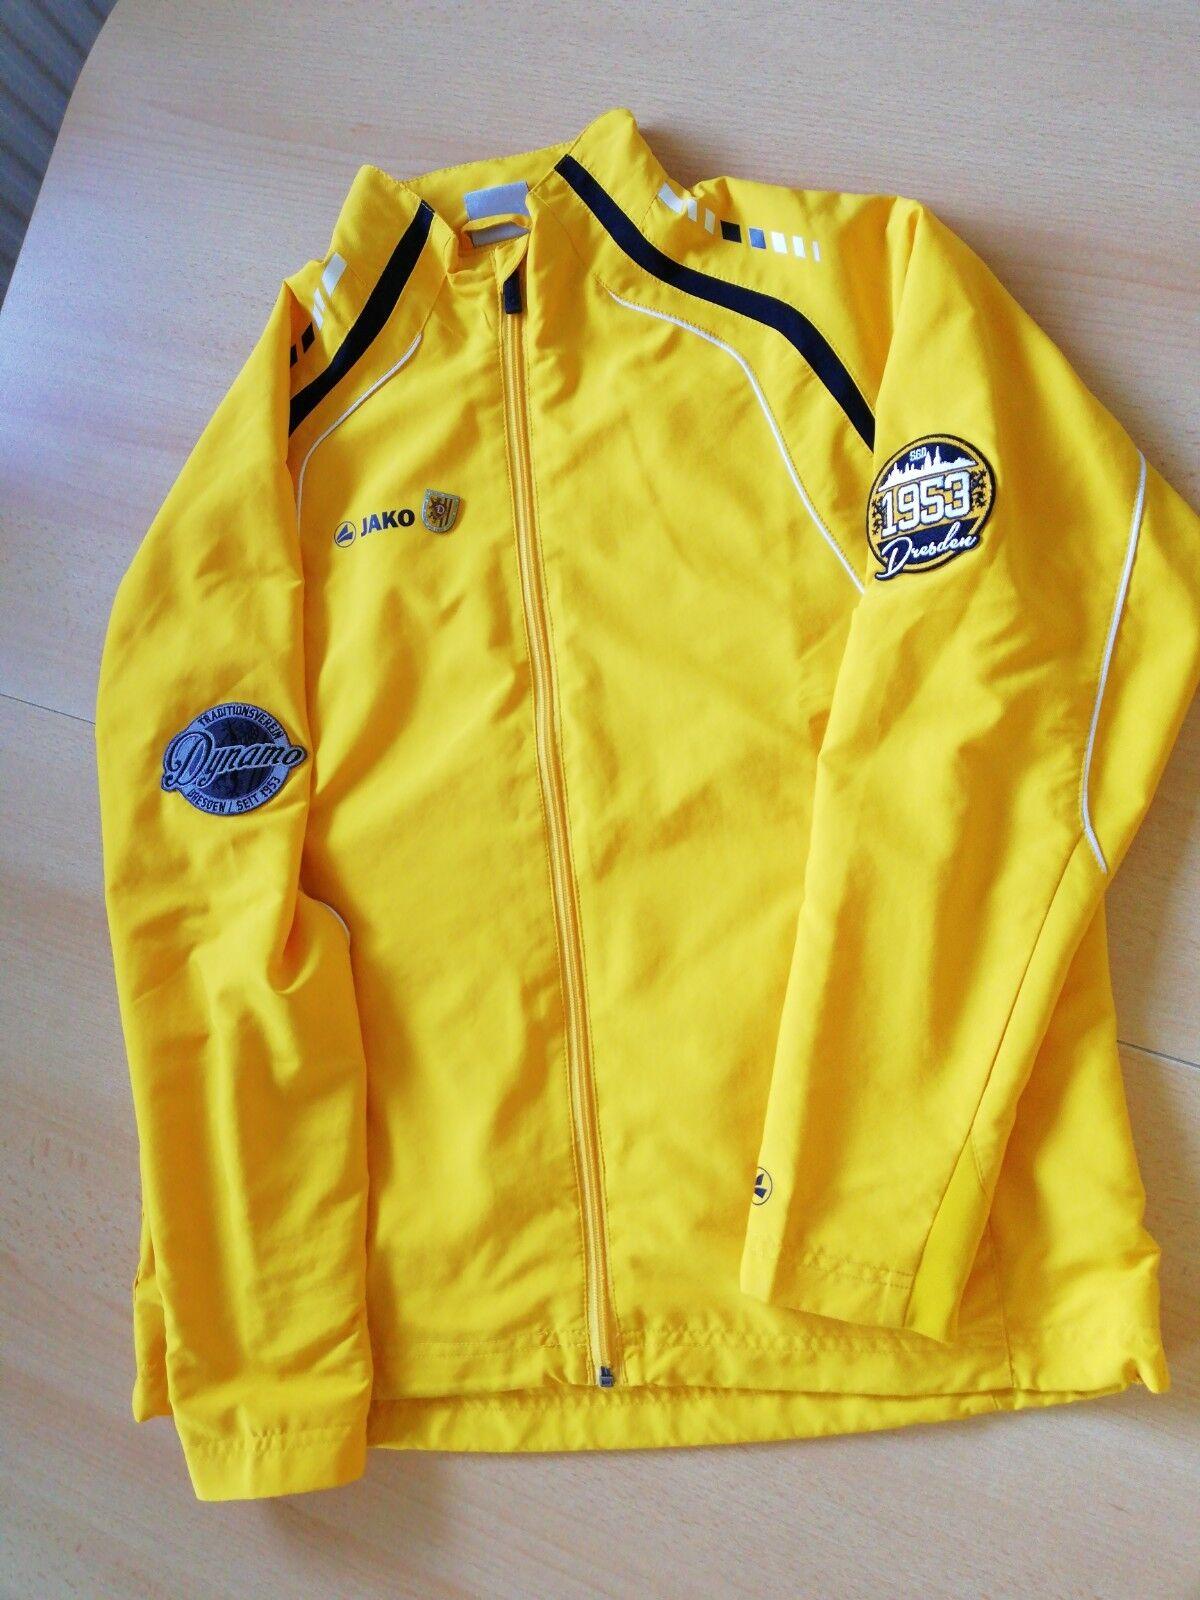 Sportbekleidung Fanbekleidung Trainingsanzug Trainingsanzug Trainingsanzug Dynamo Dresden JAKO d61a65